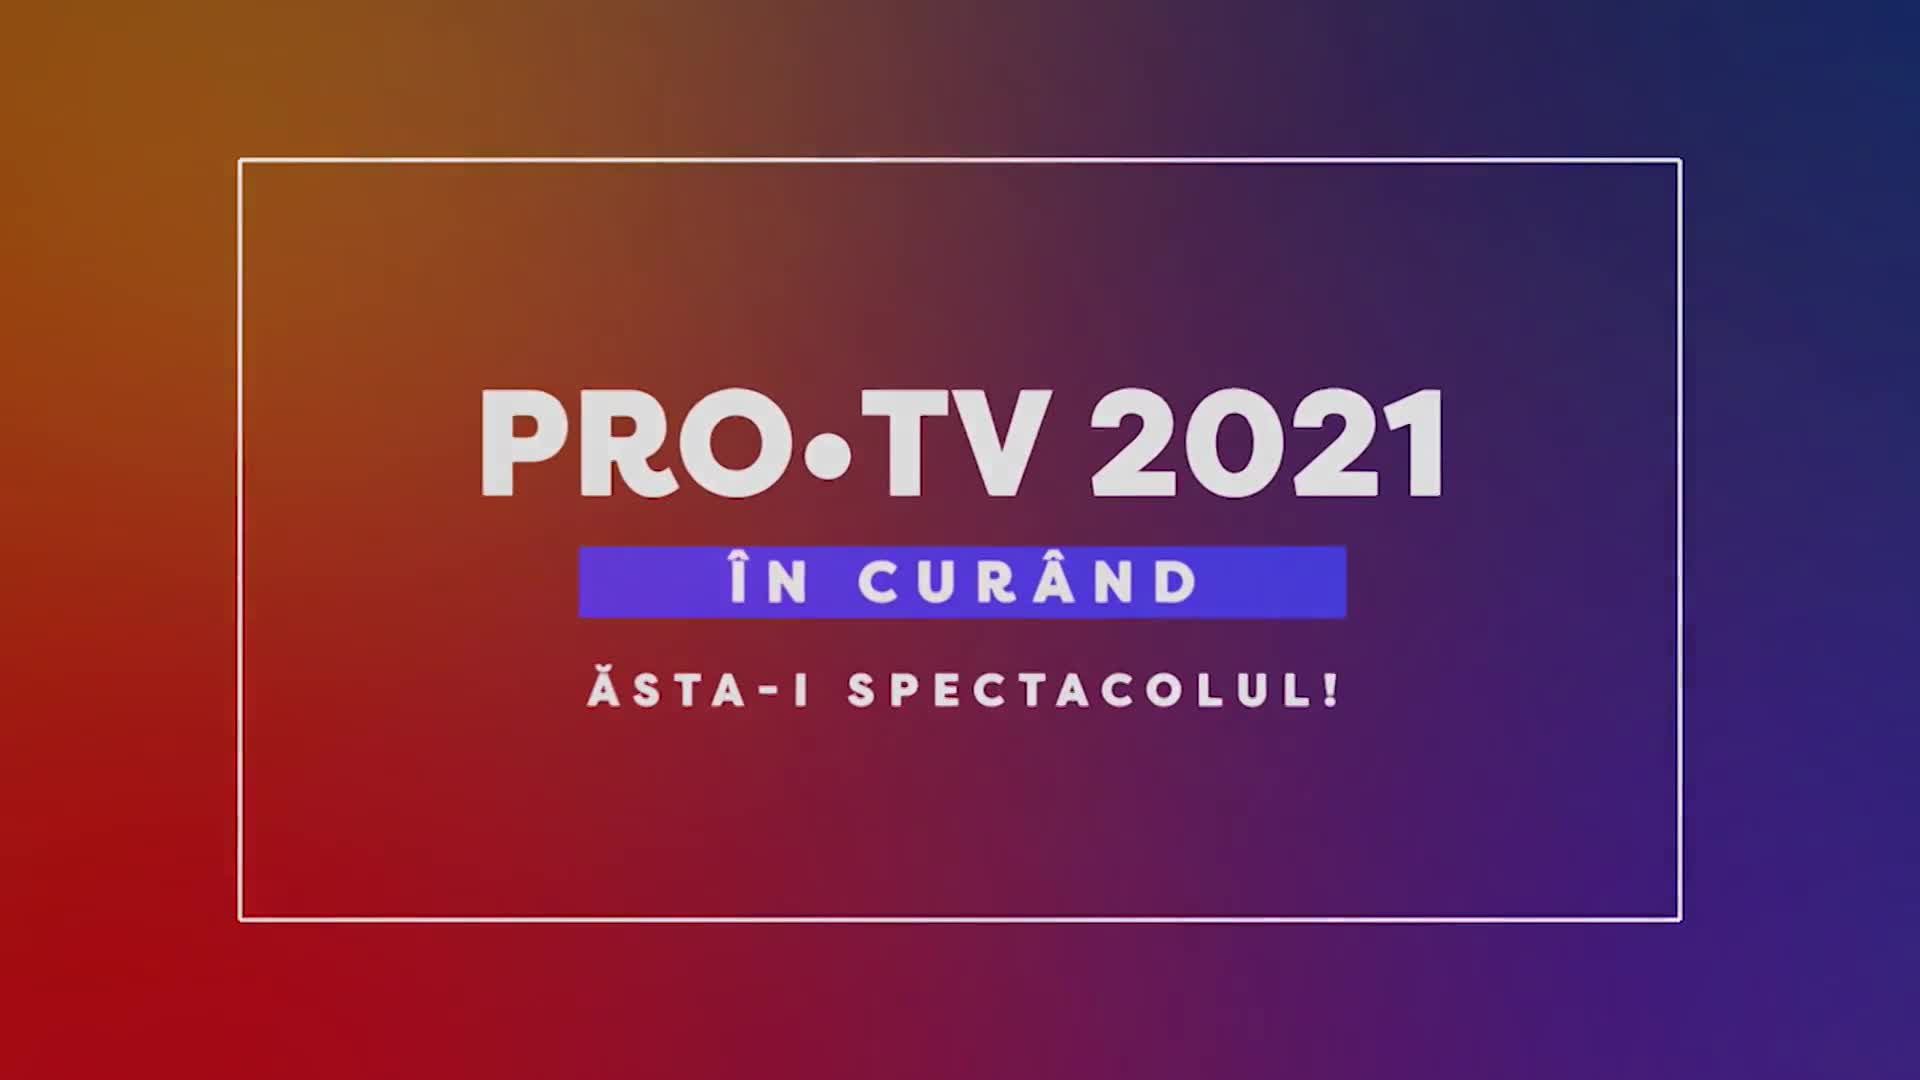 PRO TV Tease 2021 60 sec - DA